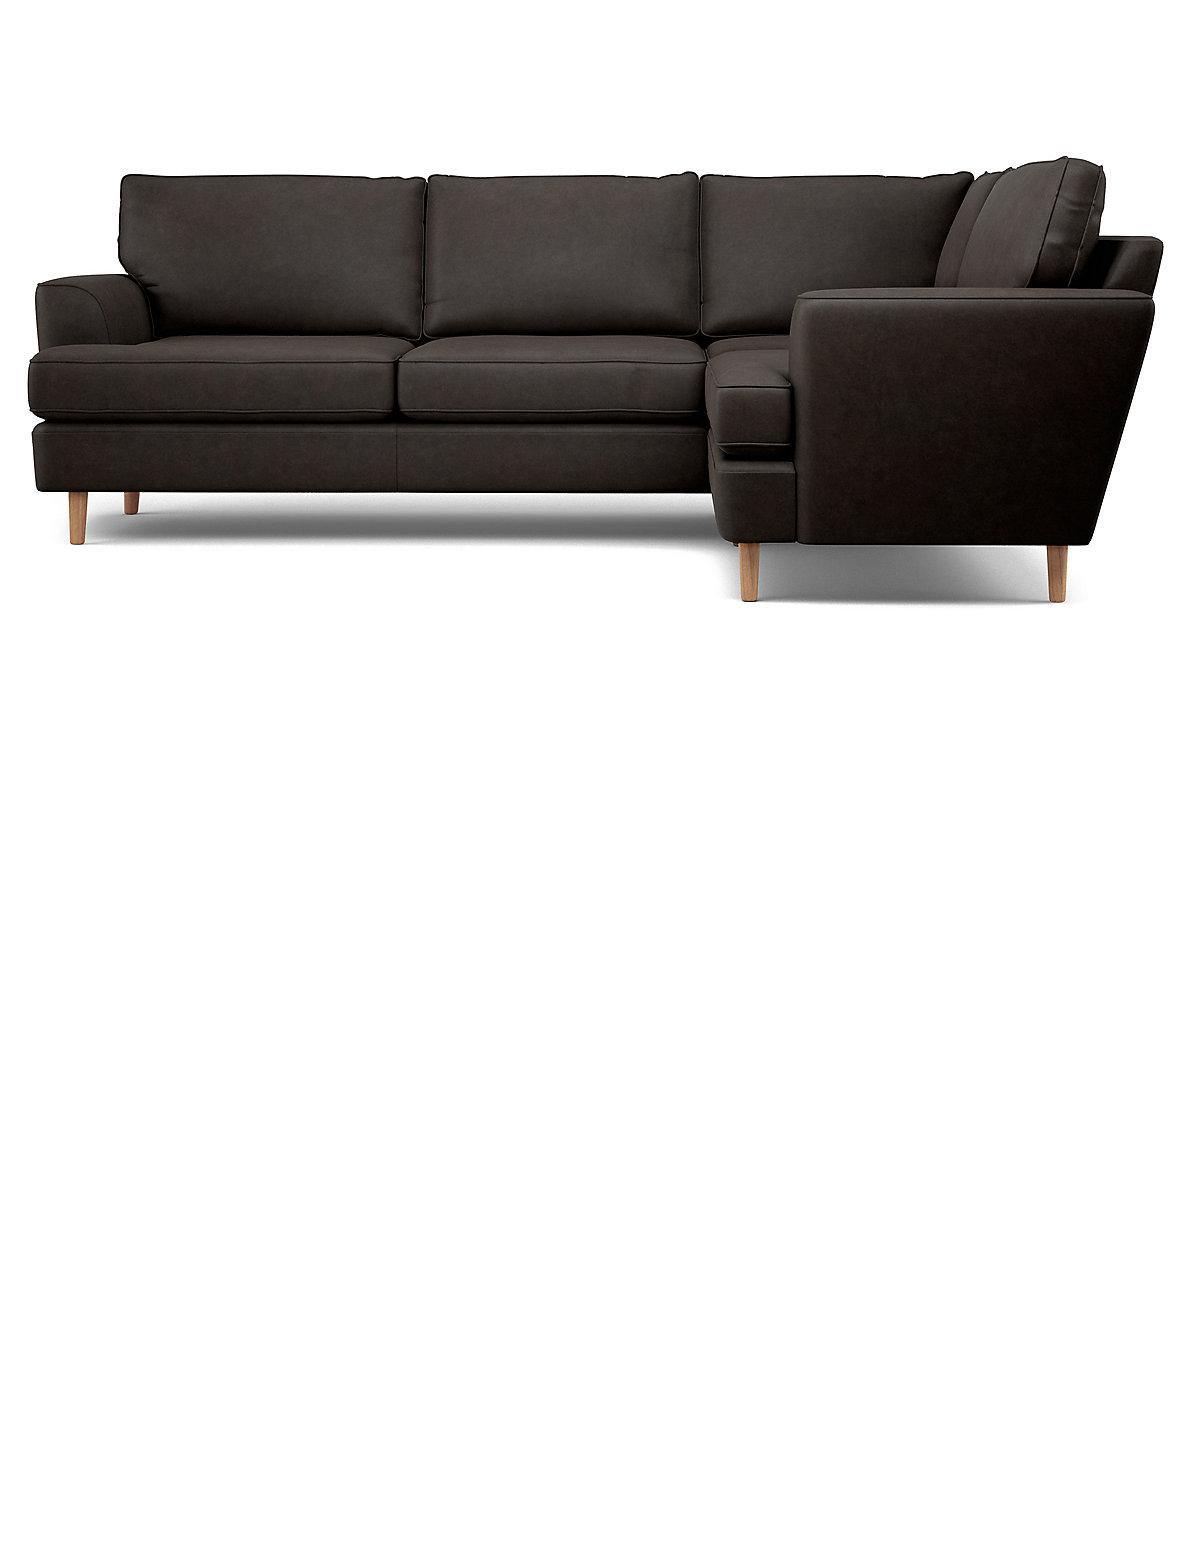 Pleasant Ms Black Copenhagen Small Corner Sofa Ix Css Creativecarmelina Interior Chair Design Creativecarmelinacom